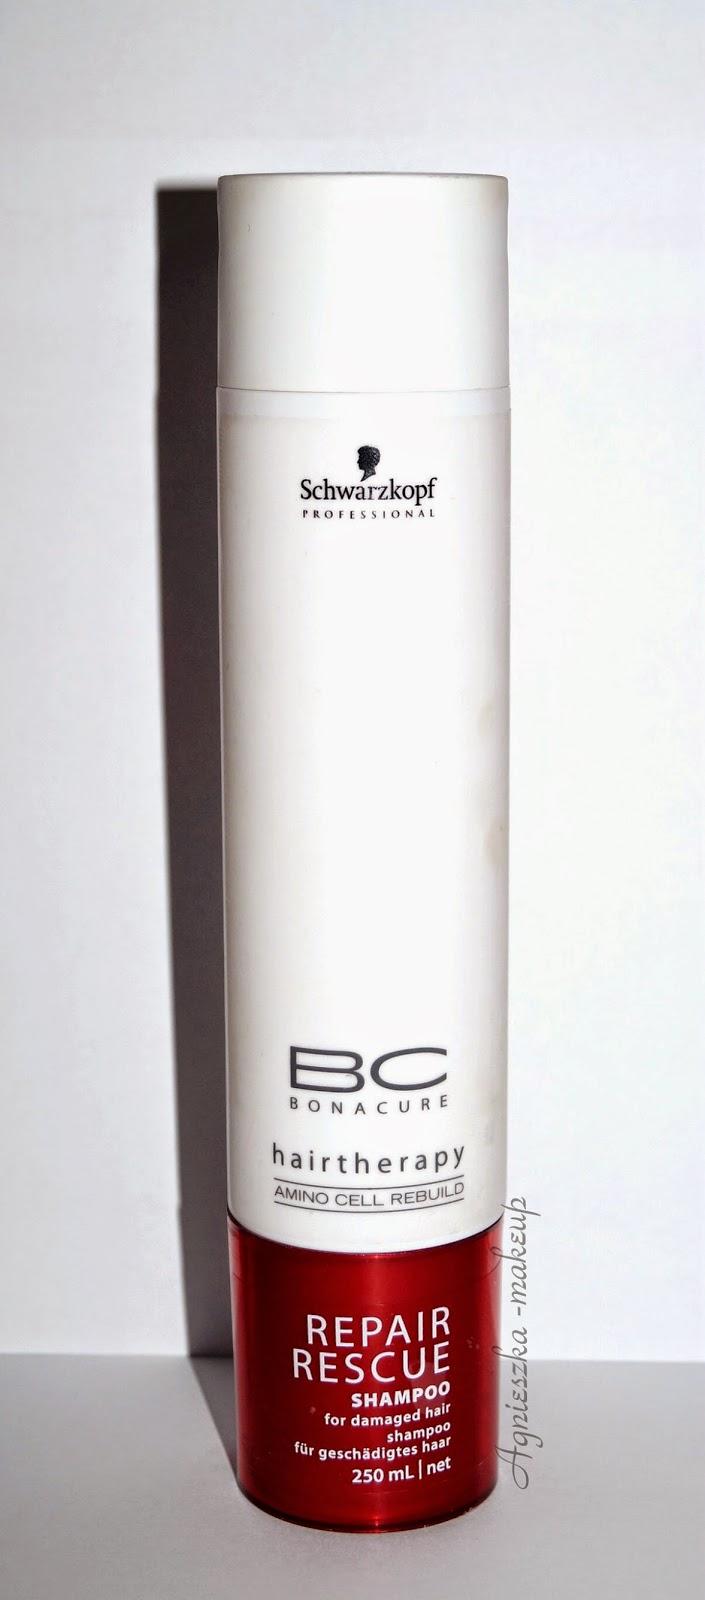 http://essenza-perfumy.pl/kategoria/pielegnacja/schwarzkopf-professional-bc-repair-rescue-szampon-250ml